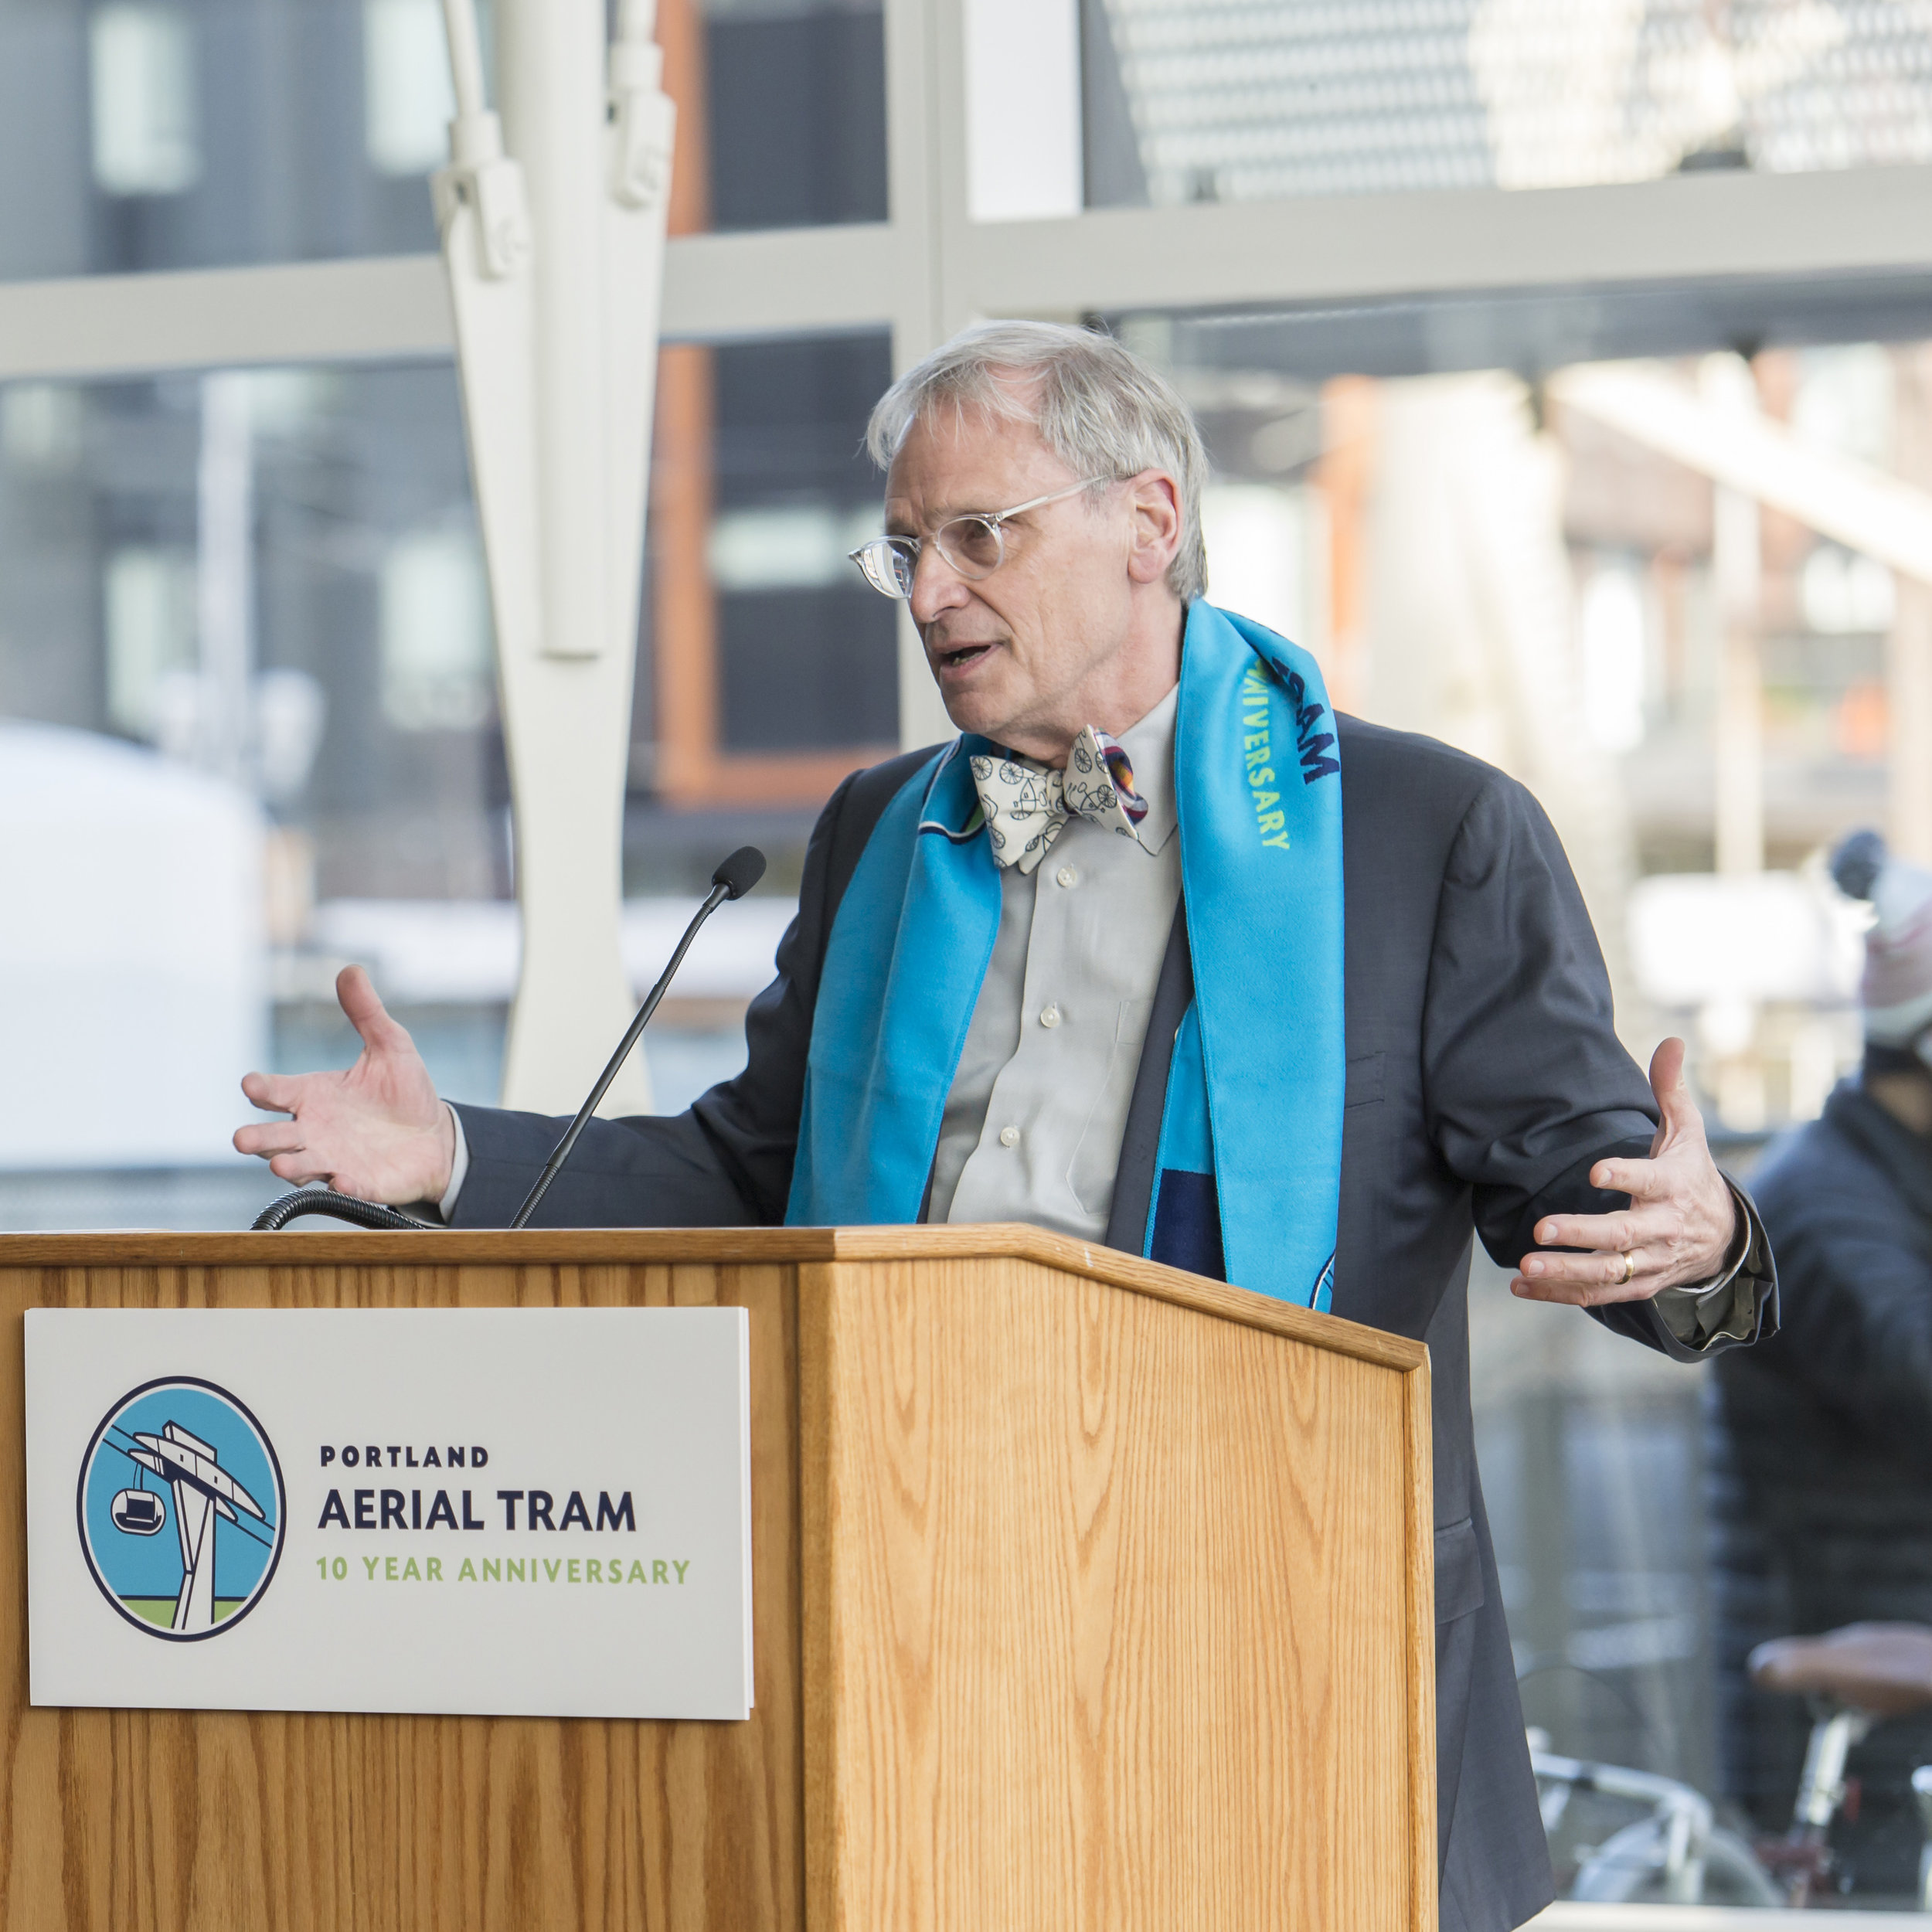 Earl Blumenauer, U.S. Congressman for Oregon's 3rd District